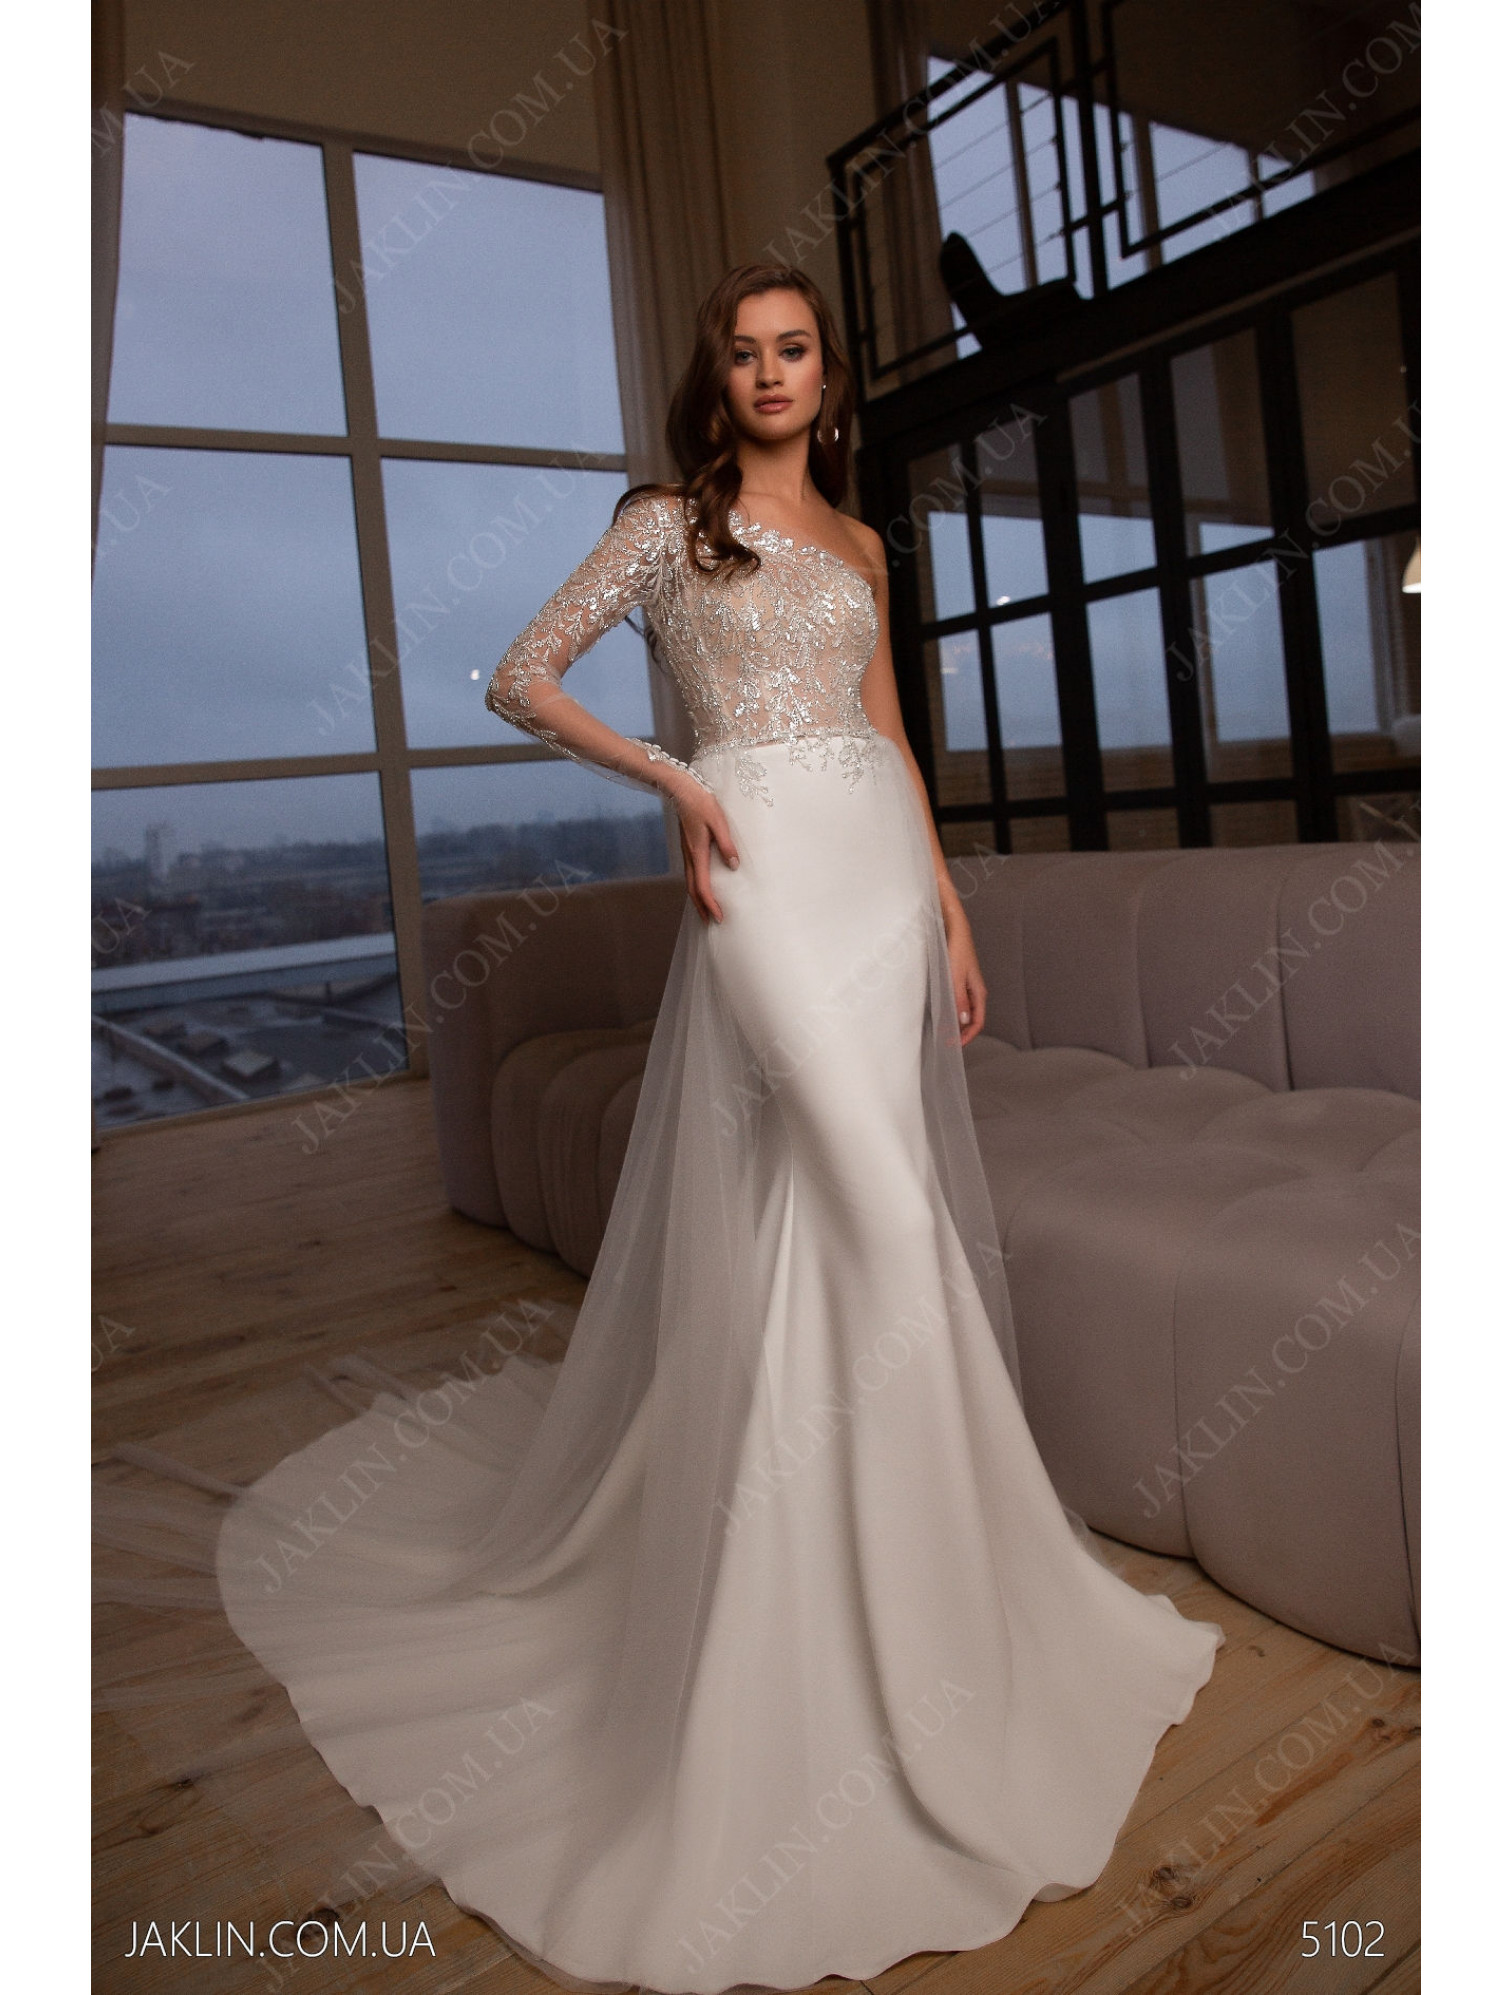 Wedding dress 5102